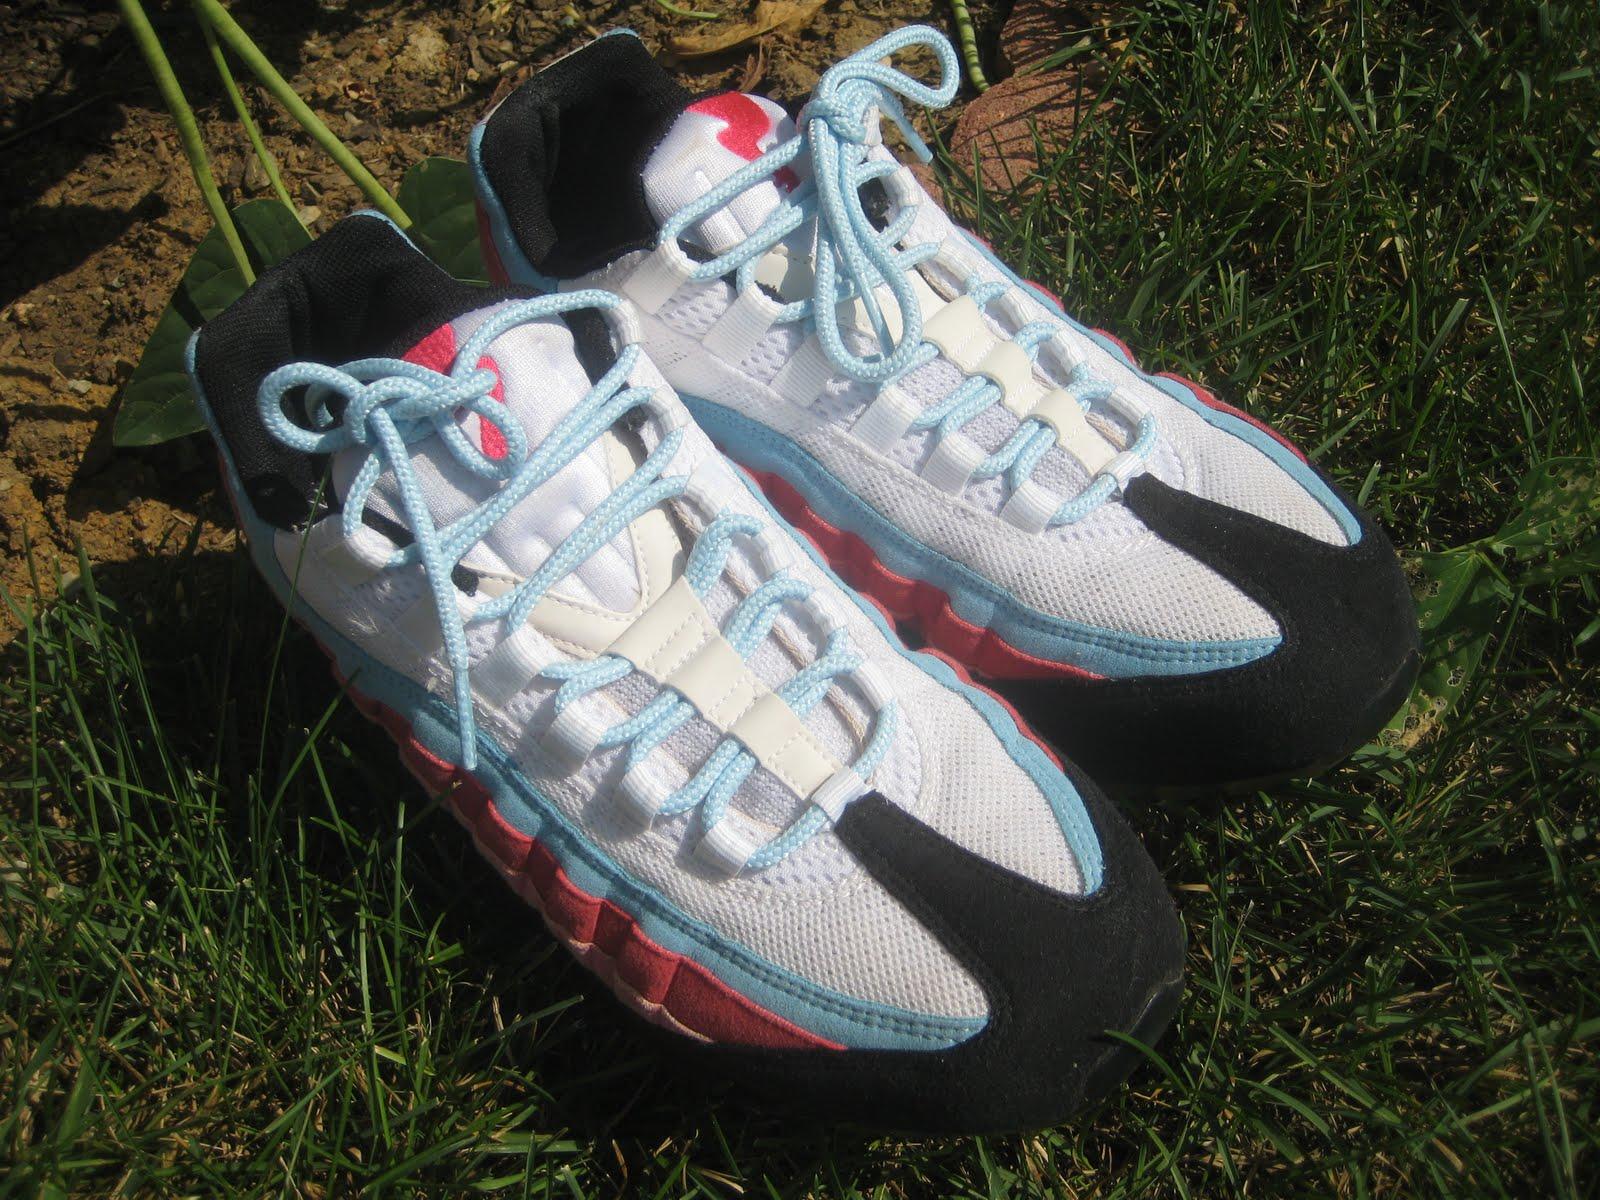 Life Under the Scope  Nike Air Max 95 QS – Running Man Pack x Parra ddba7a0bc